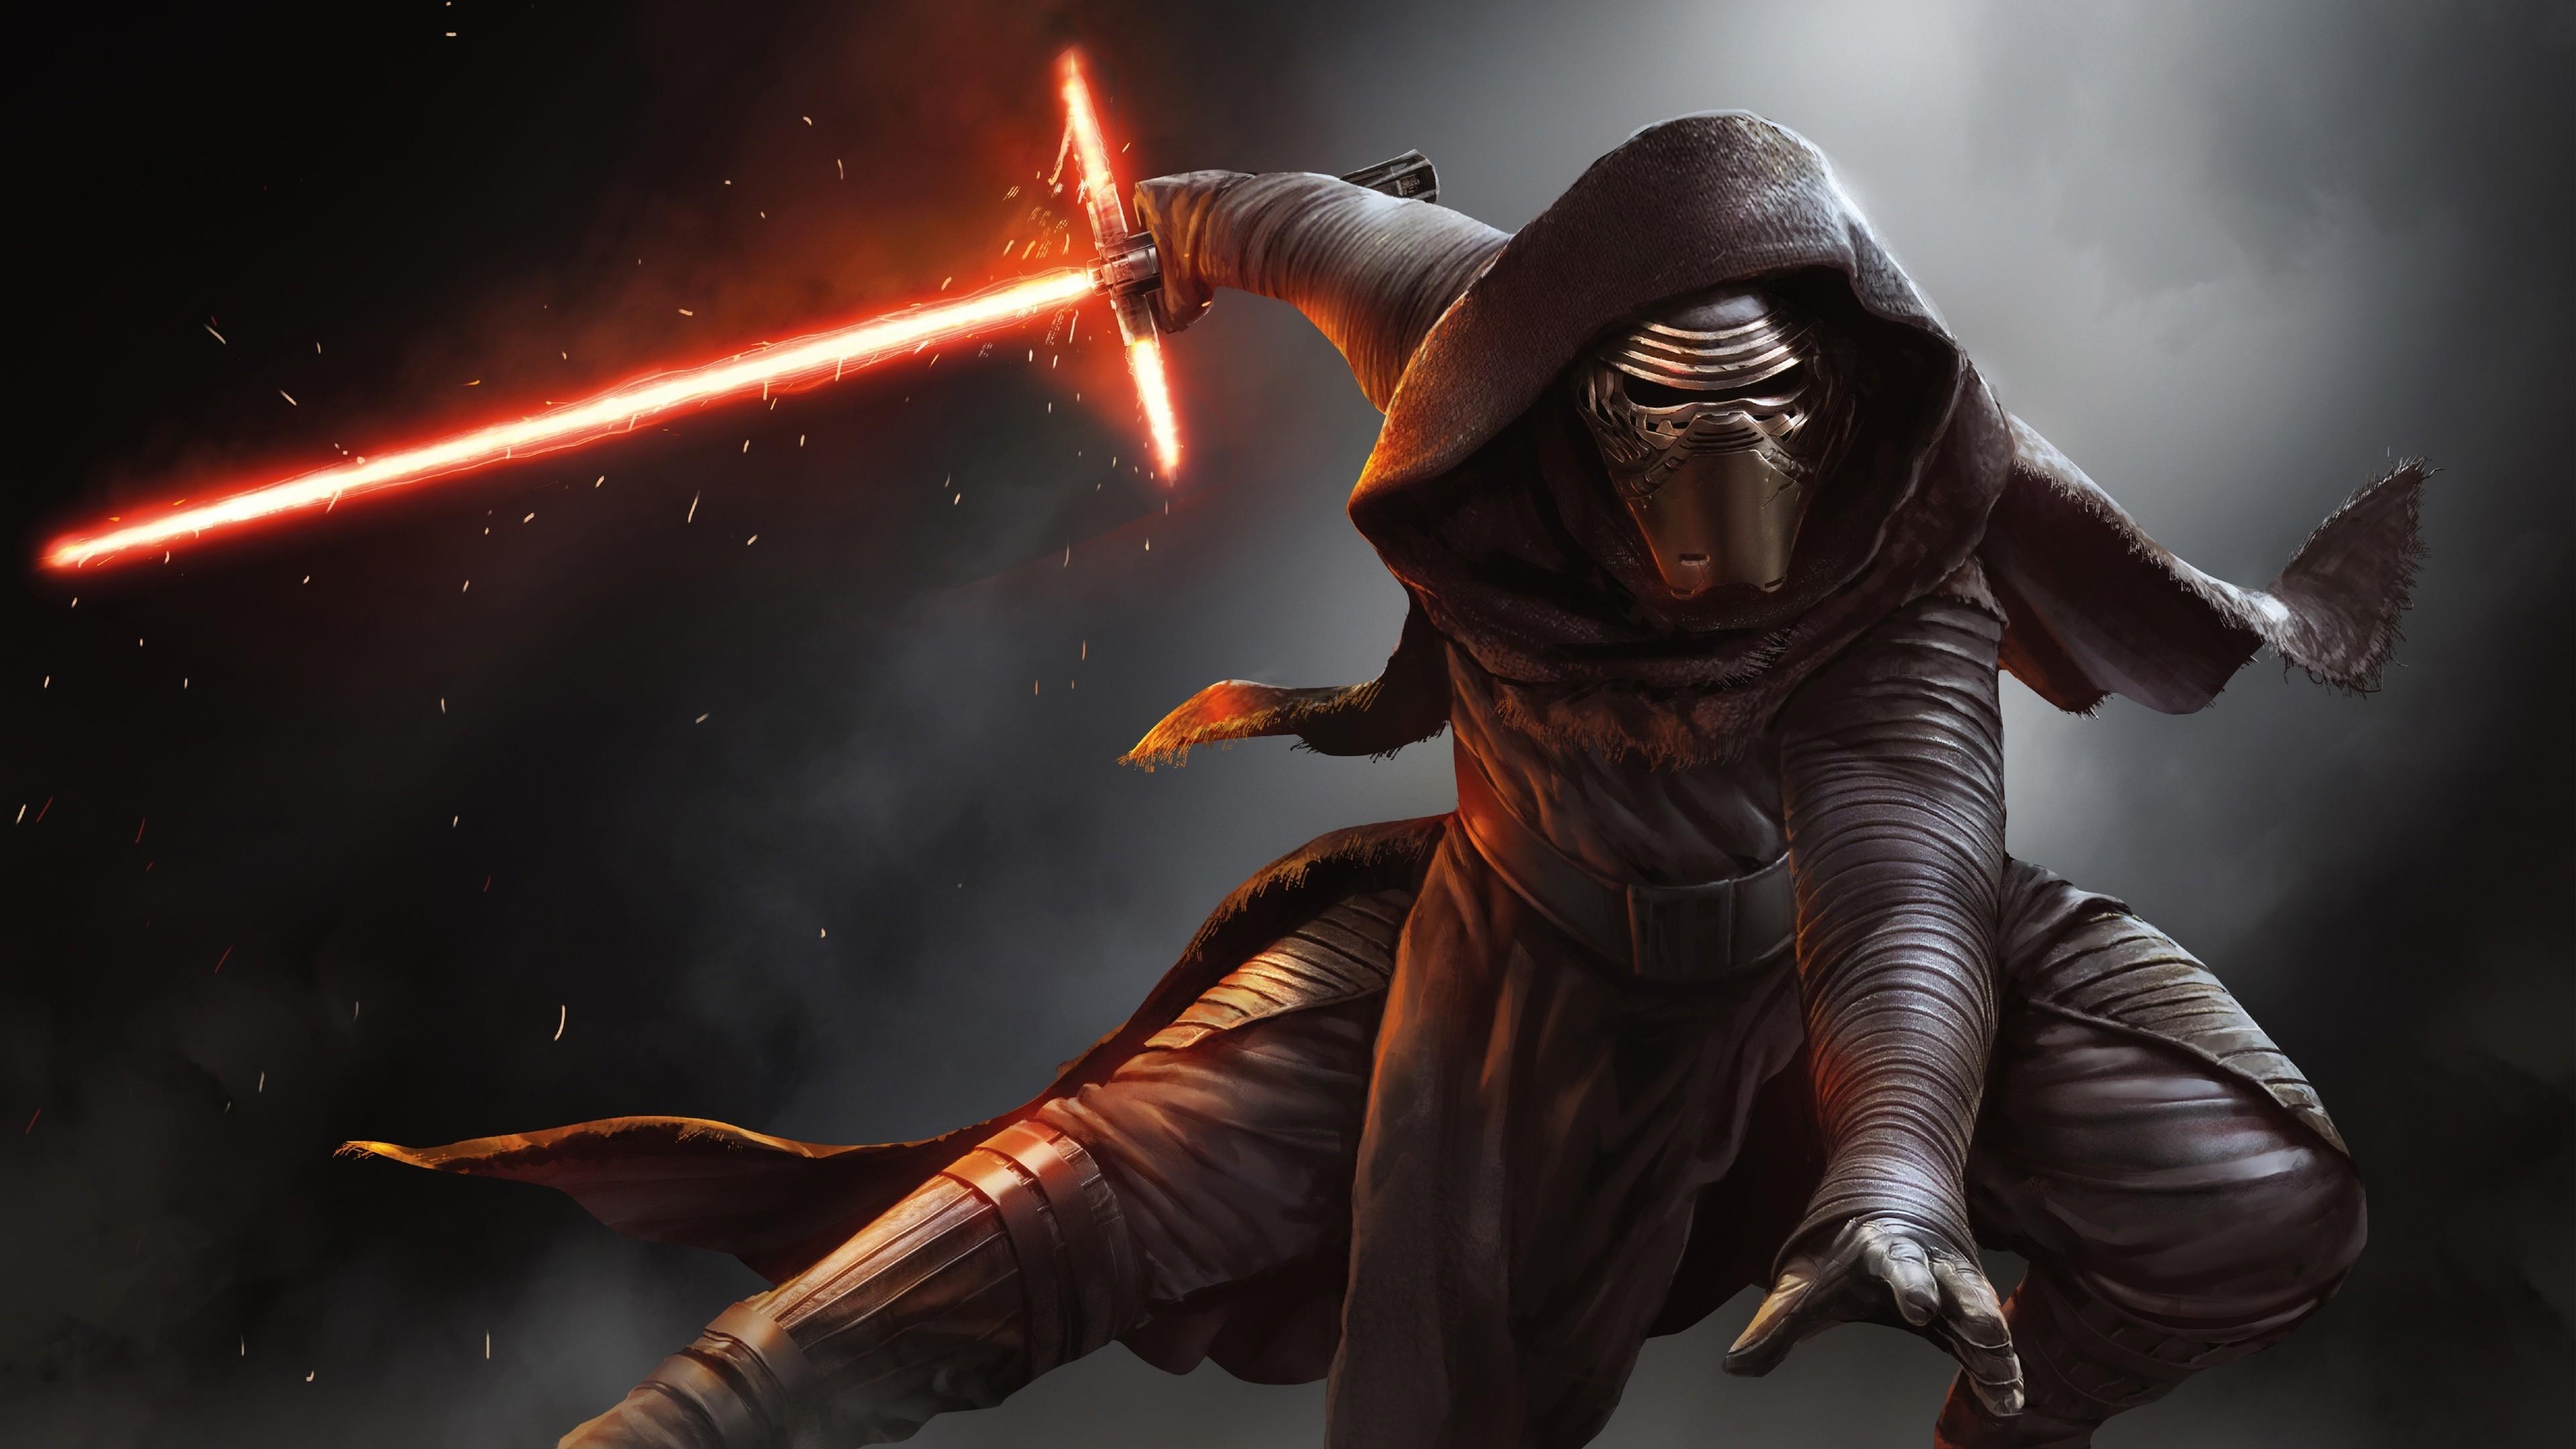 wallpaper star wars: episode vii - the force awakens, movies #7207